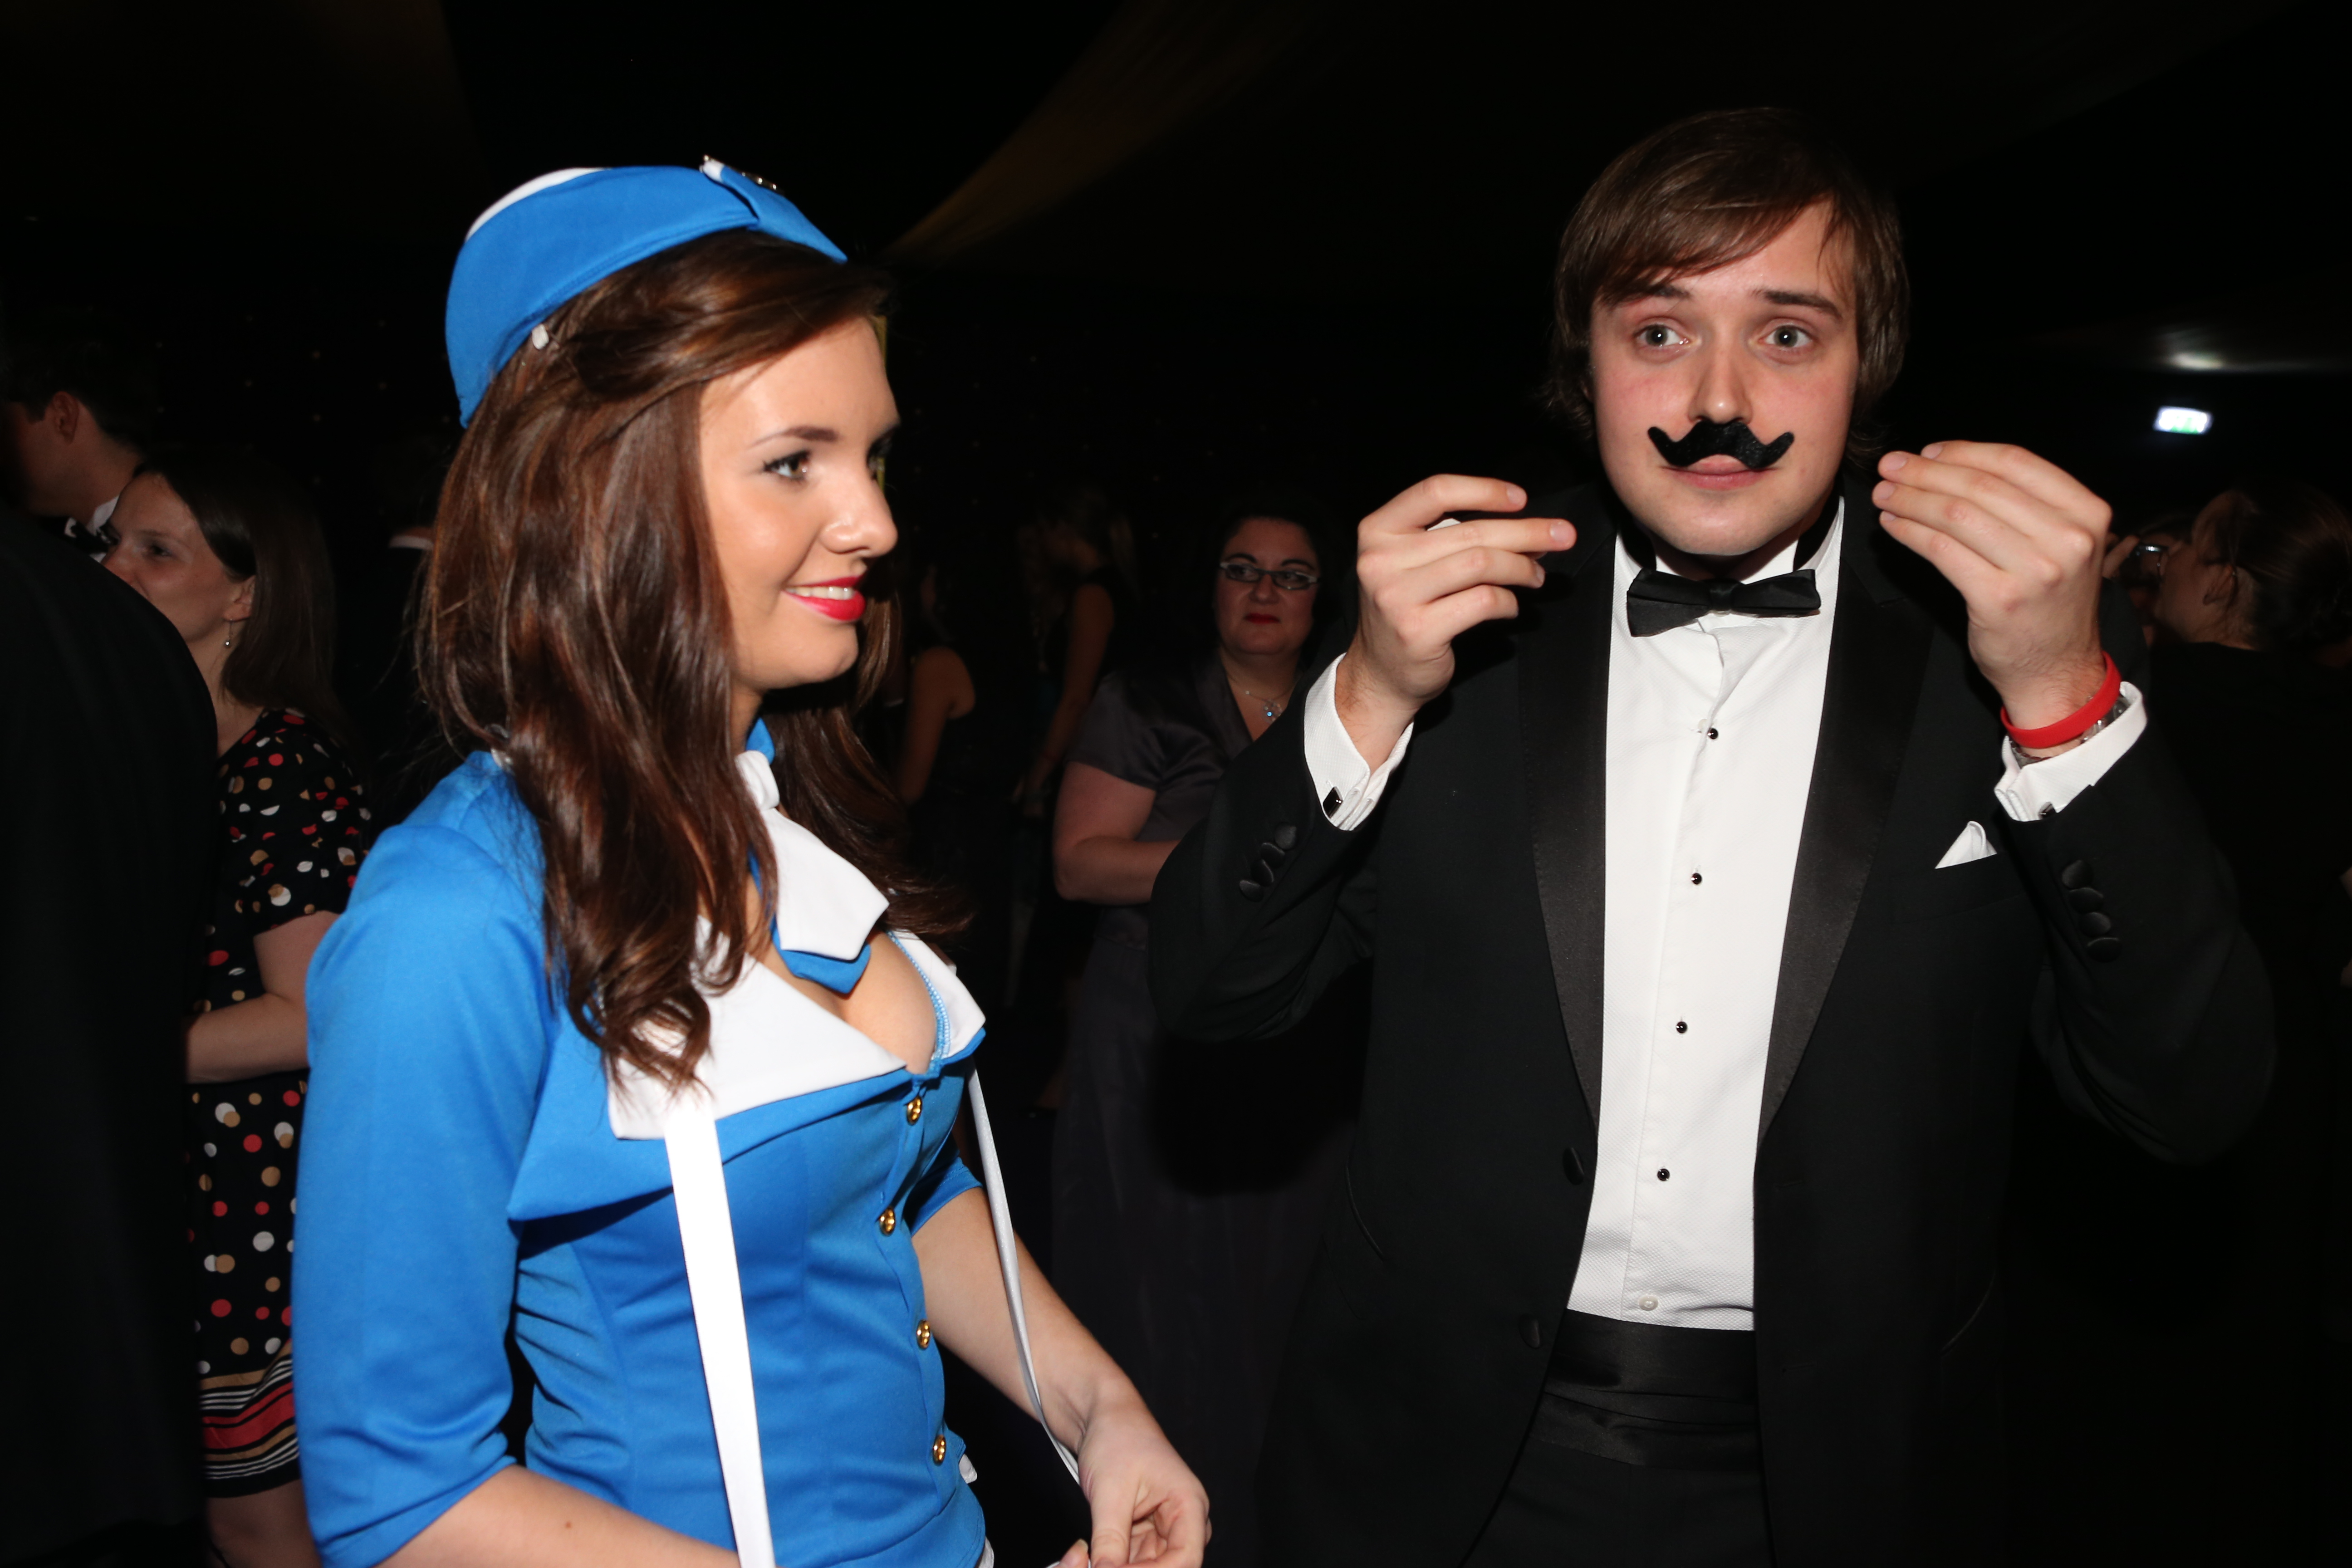 B2B Marketing air stewardess raises money for Movember